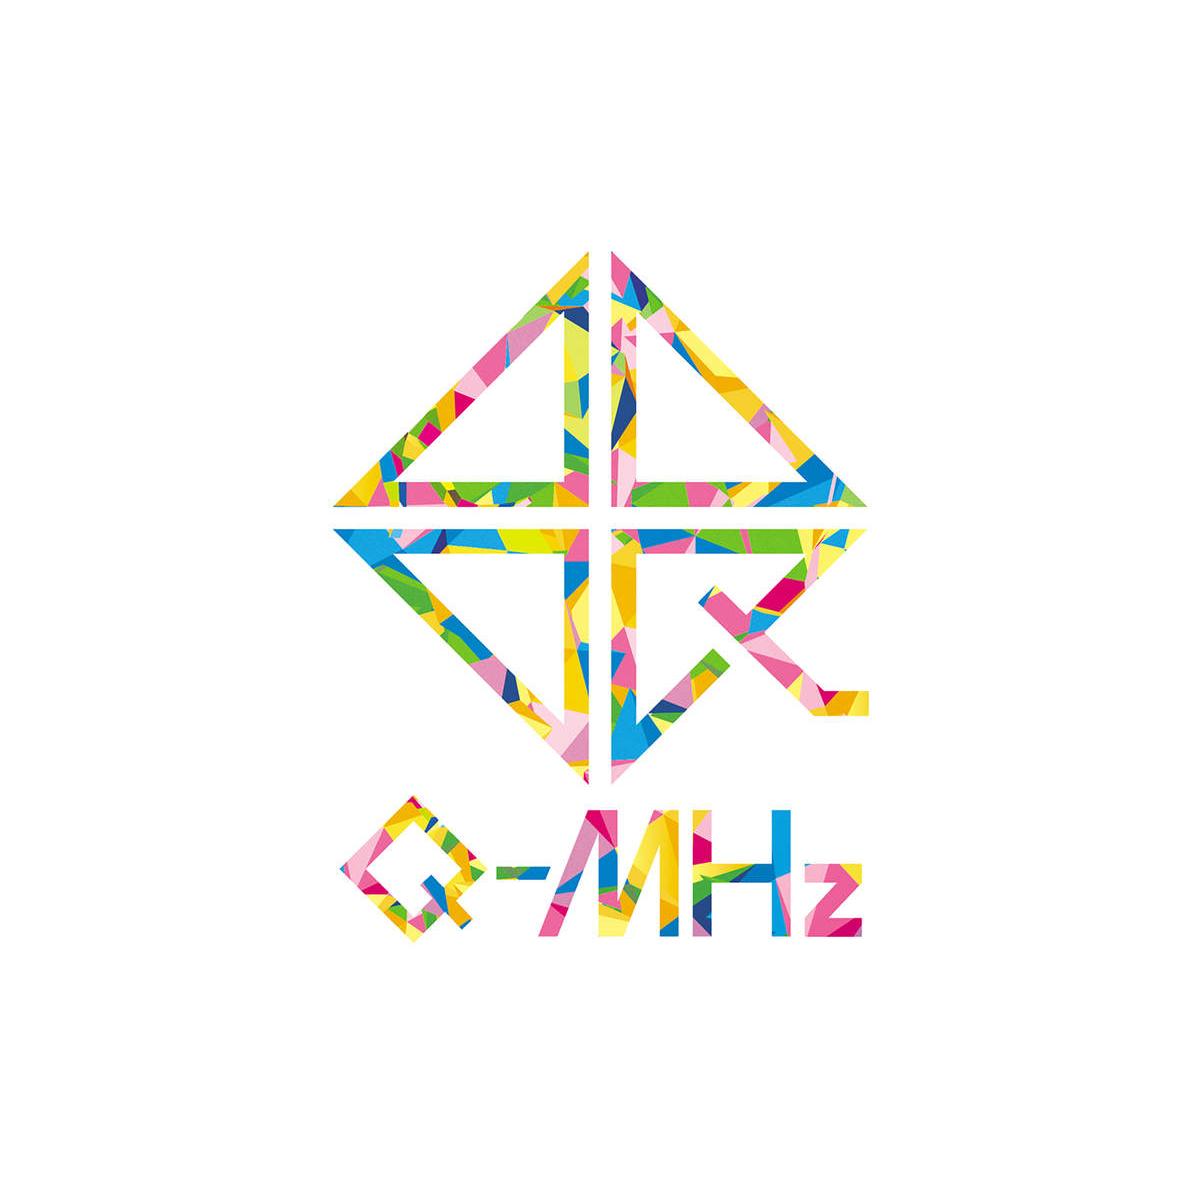 Taki Taki Lyrics Song Download: Q-MHz. Soundtrack From Q-MHz